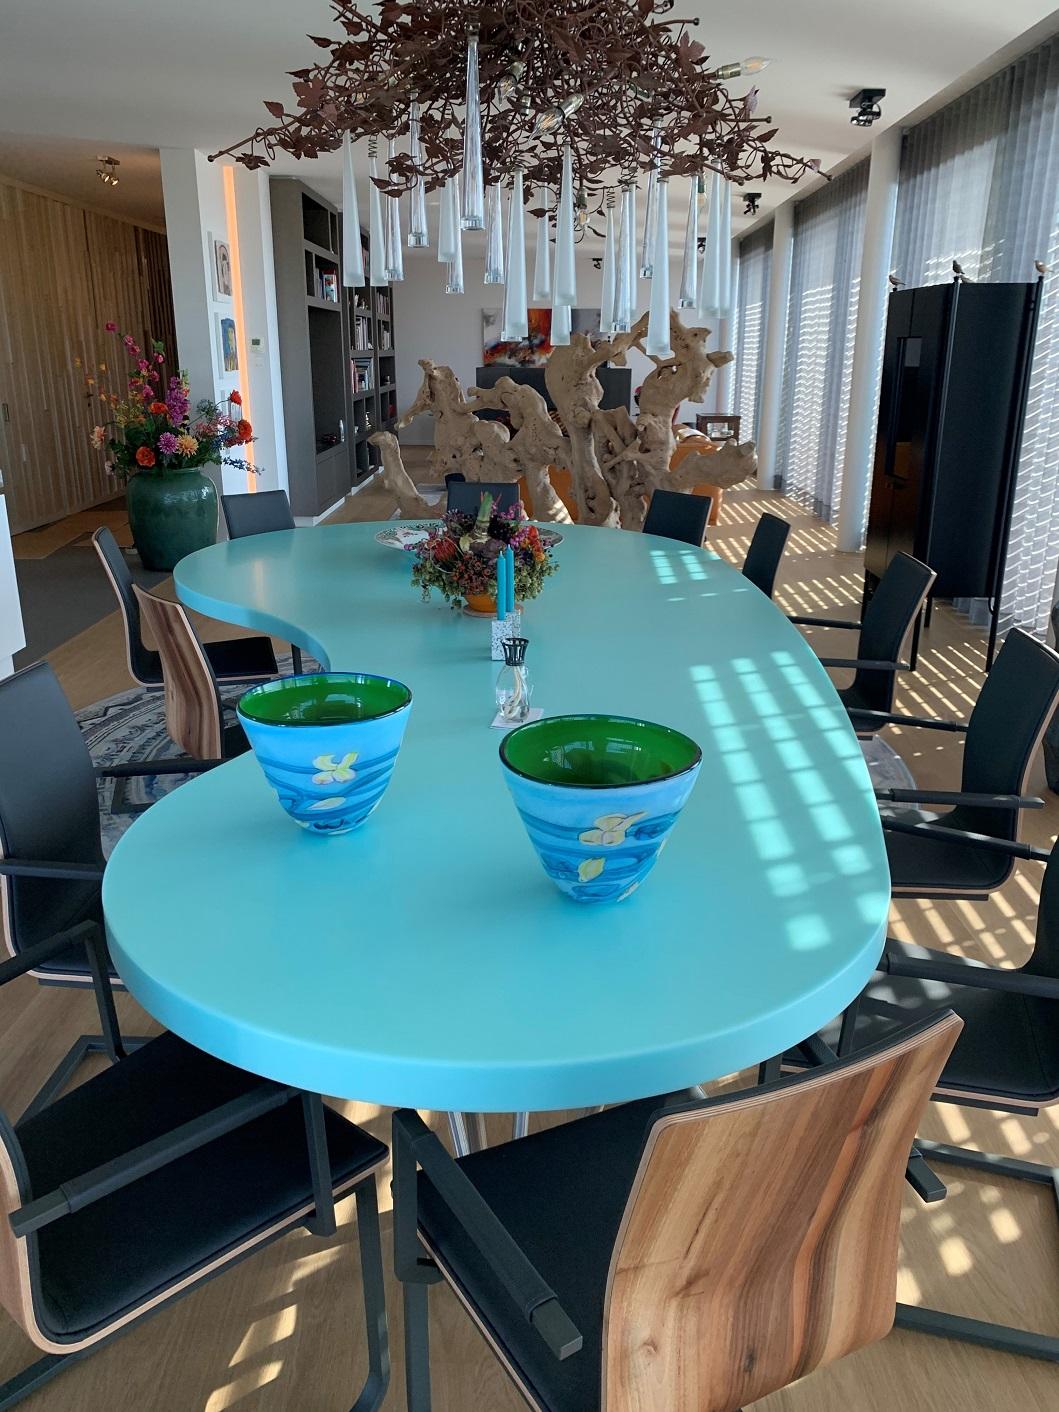 CORA Projects - Solid Surface tafelblad - HI-MACS S305 Emerald 4 - gedraaid - verkleind